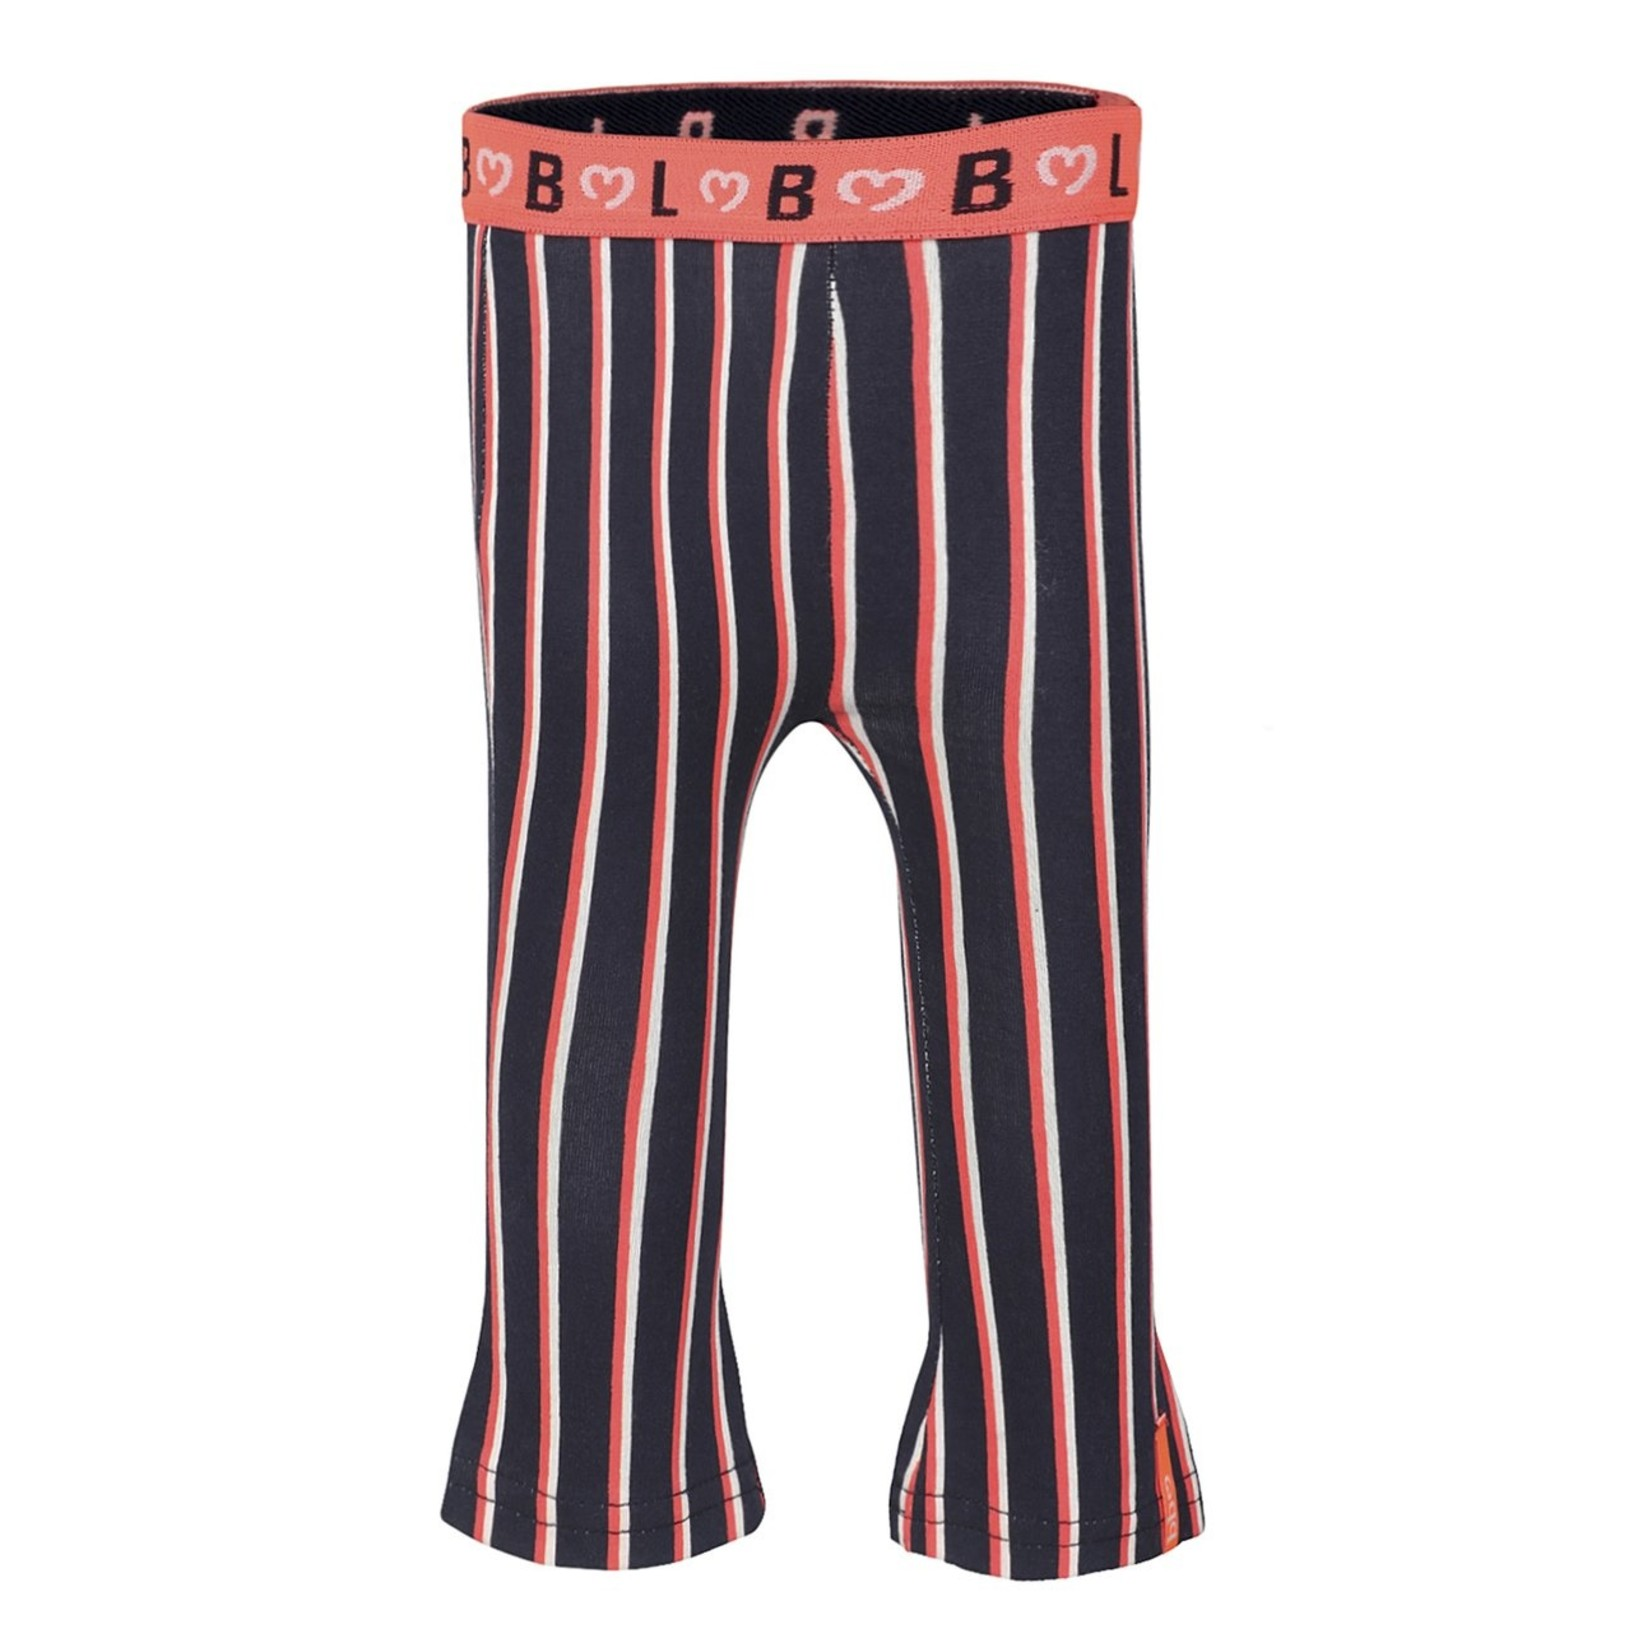 Beebielove Pants bbl 2672